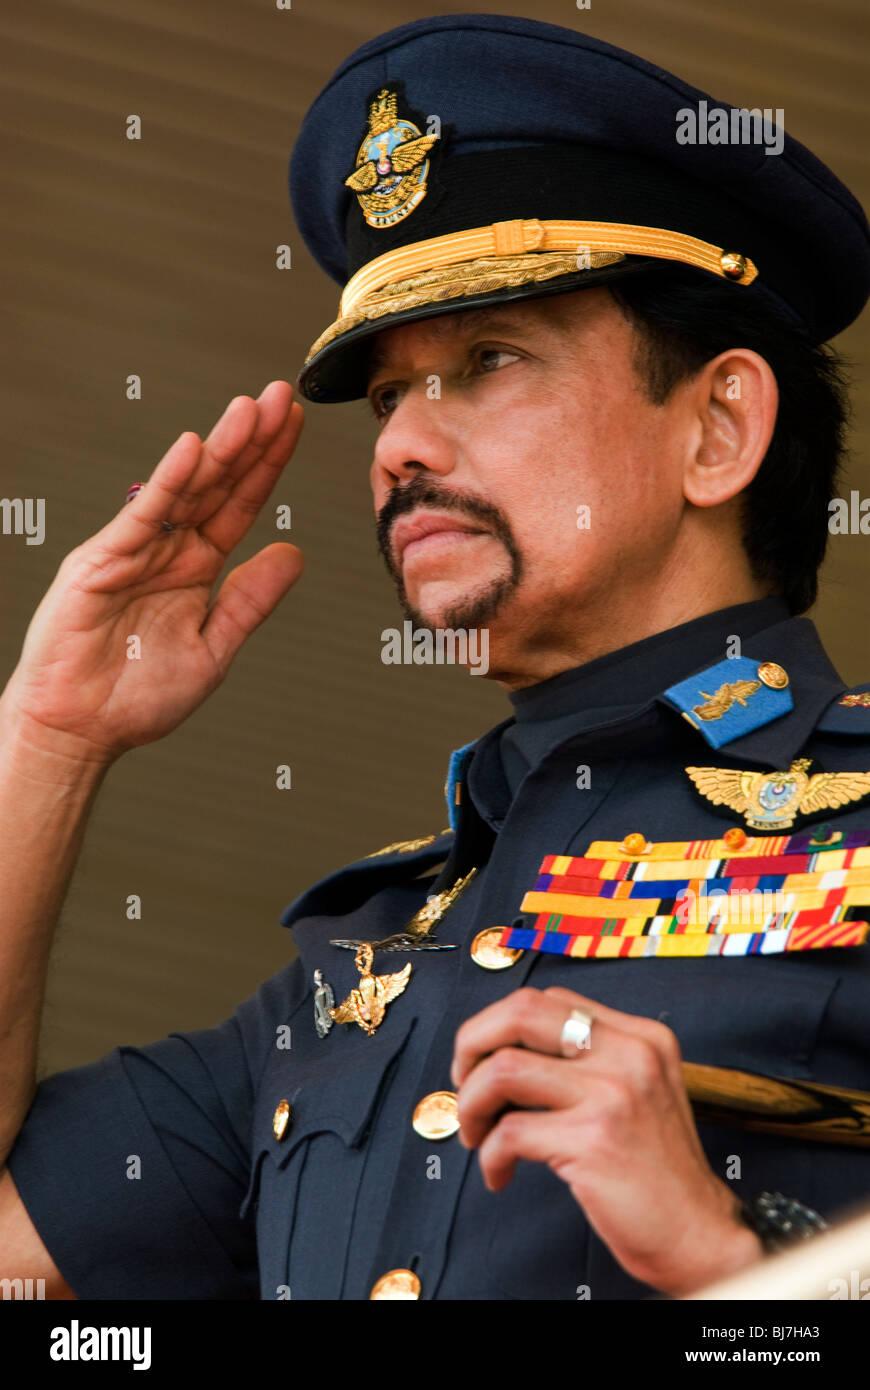 Sultan of Brunei, National Day, Brunei Darussalam - Stock Image